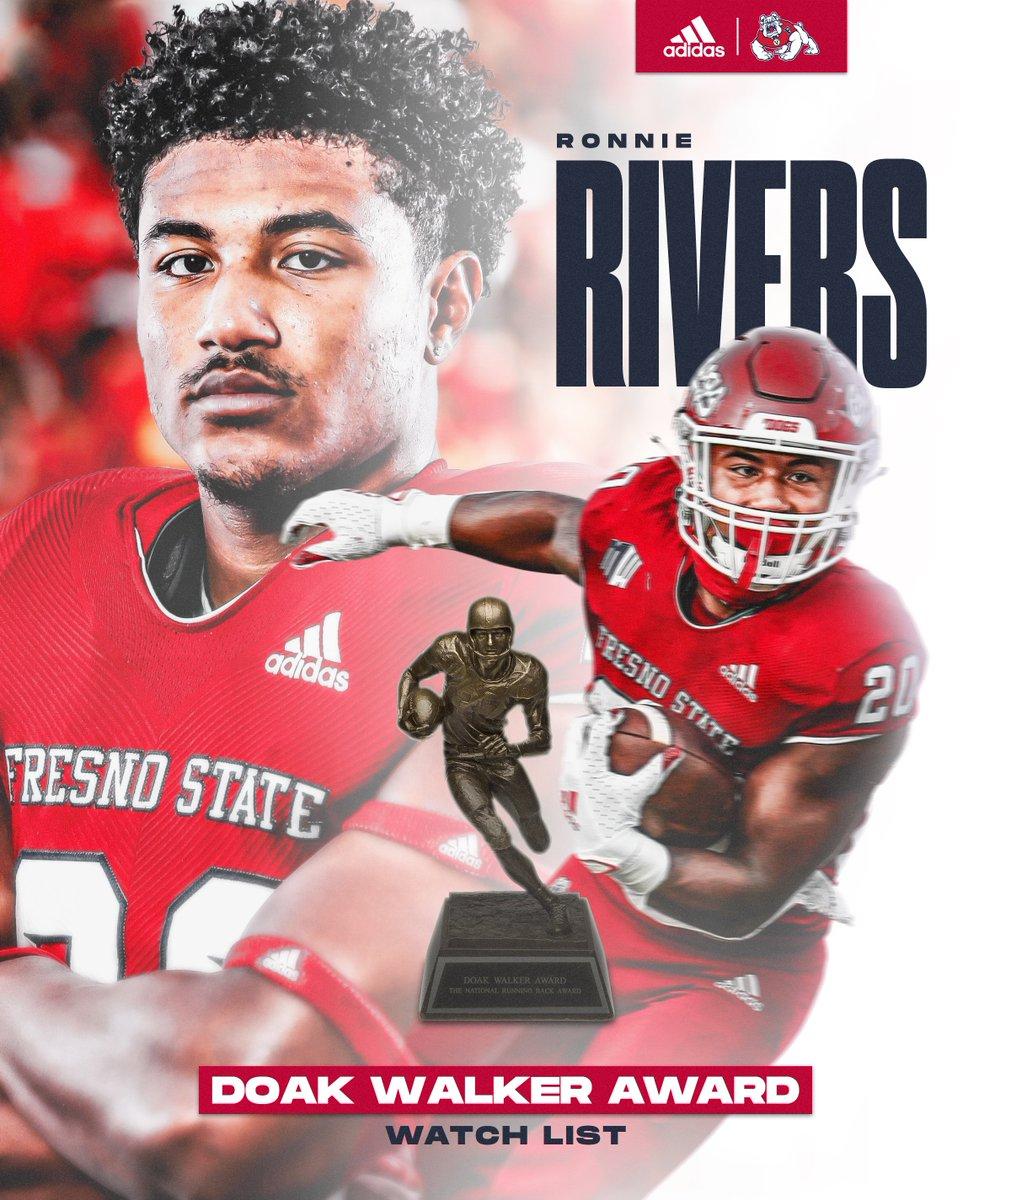 @FresnoStateFB's photo on Doak Walker Award